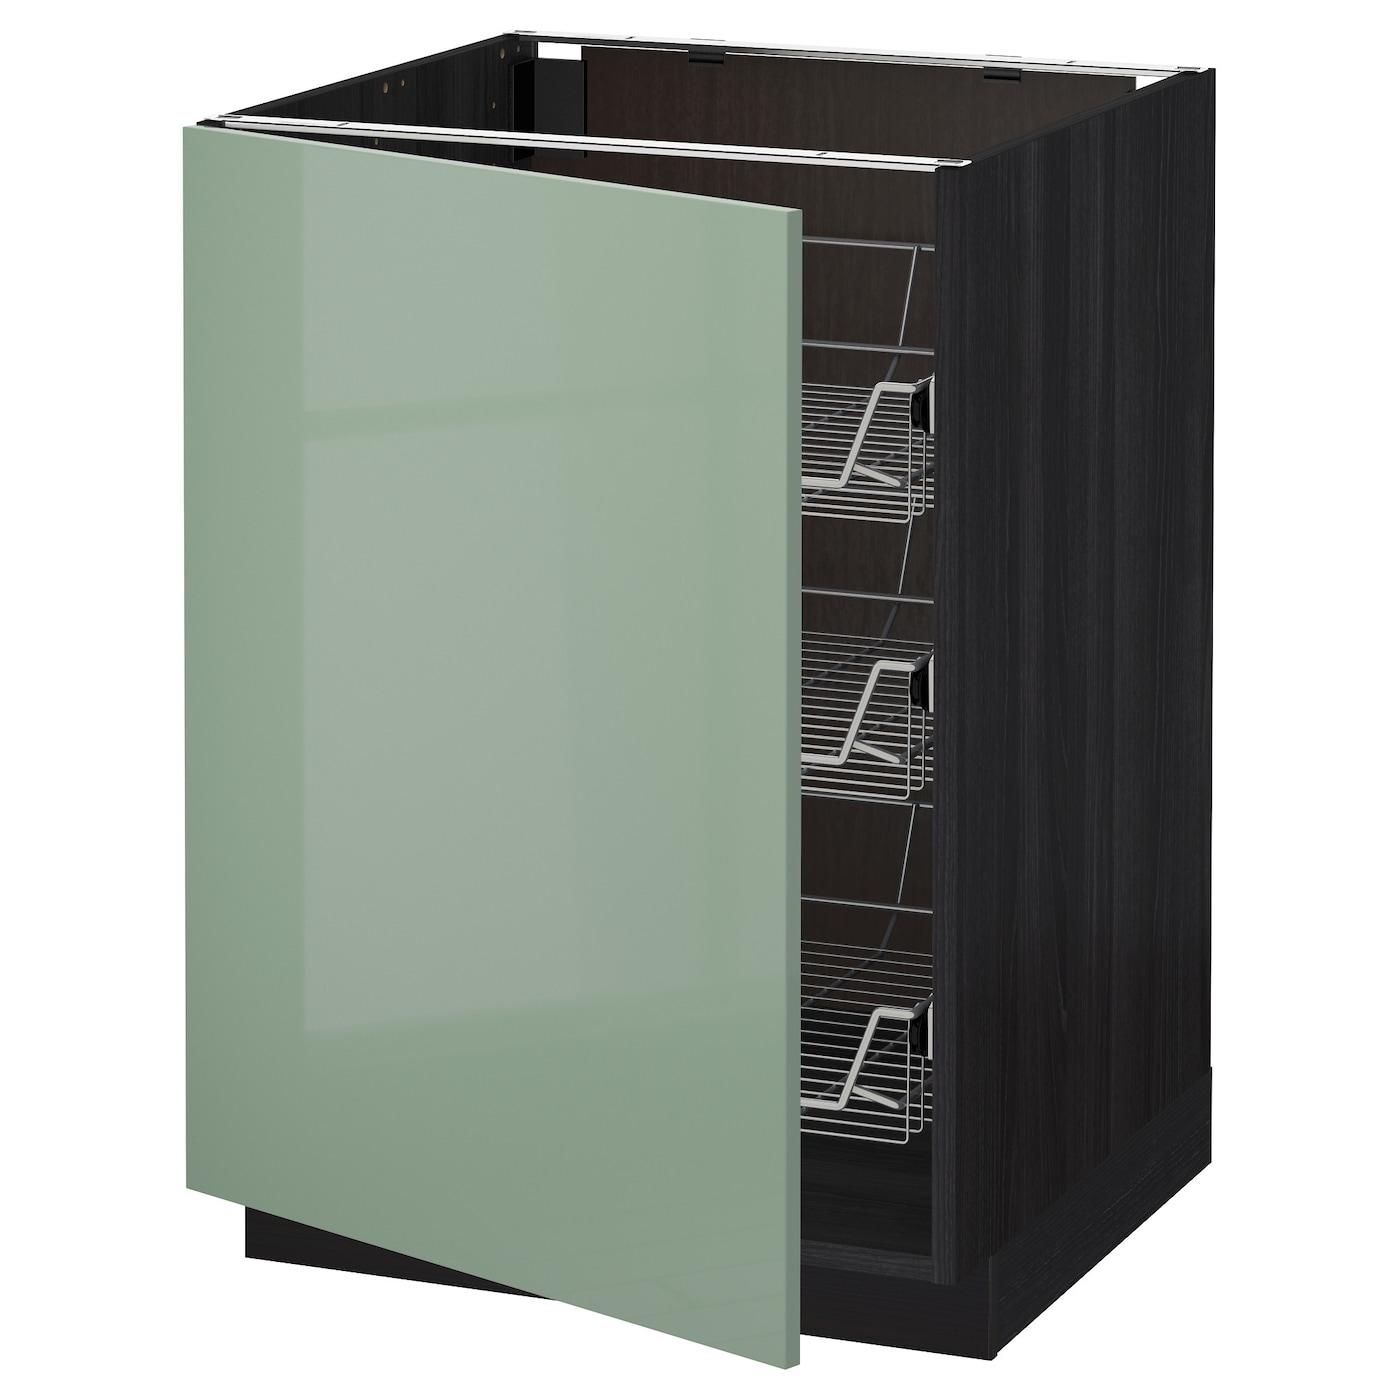 Ikea Green Kitchen Cabinets: METOD Base Cabinet With Wire Baskets Black/kallarp Light